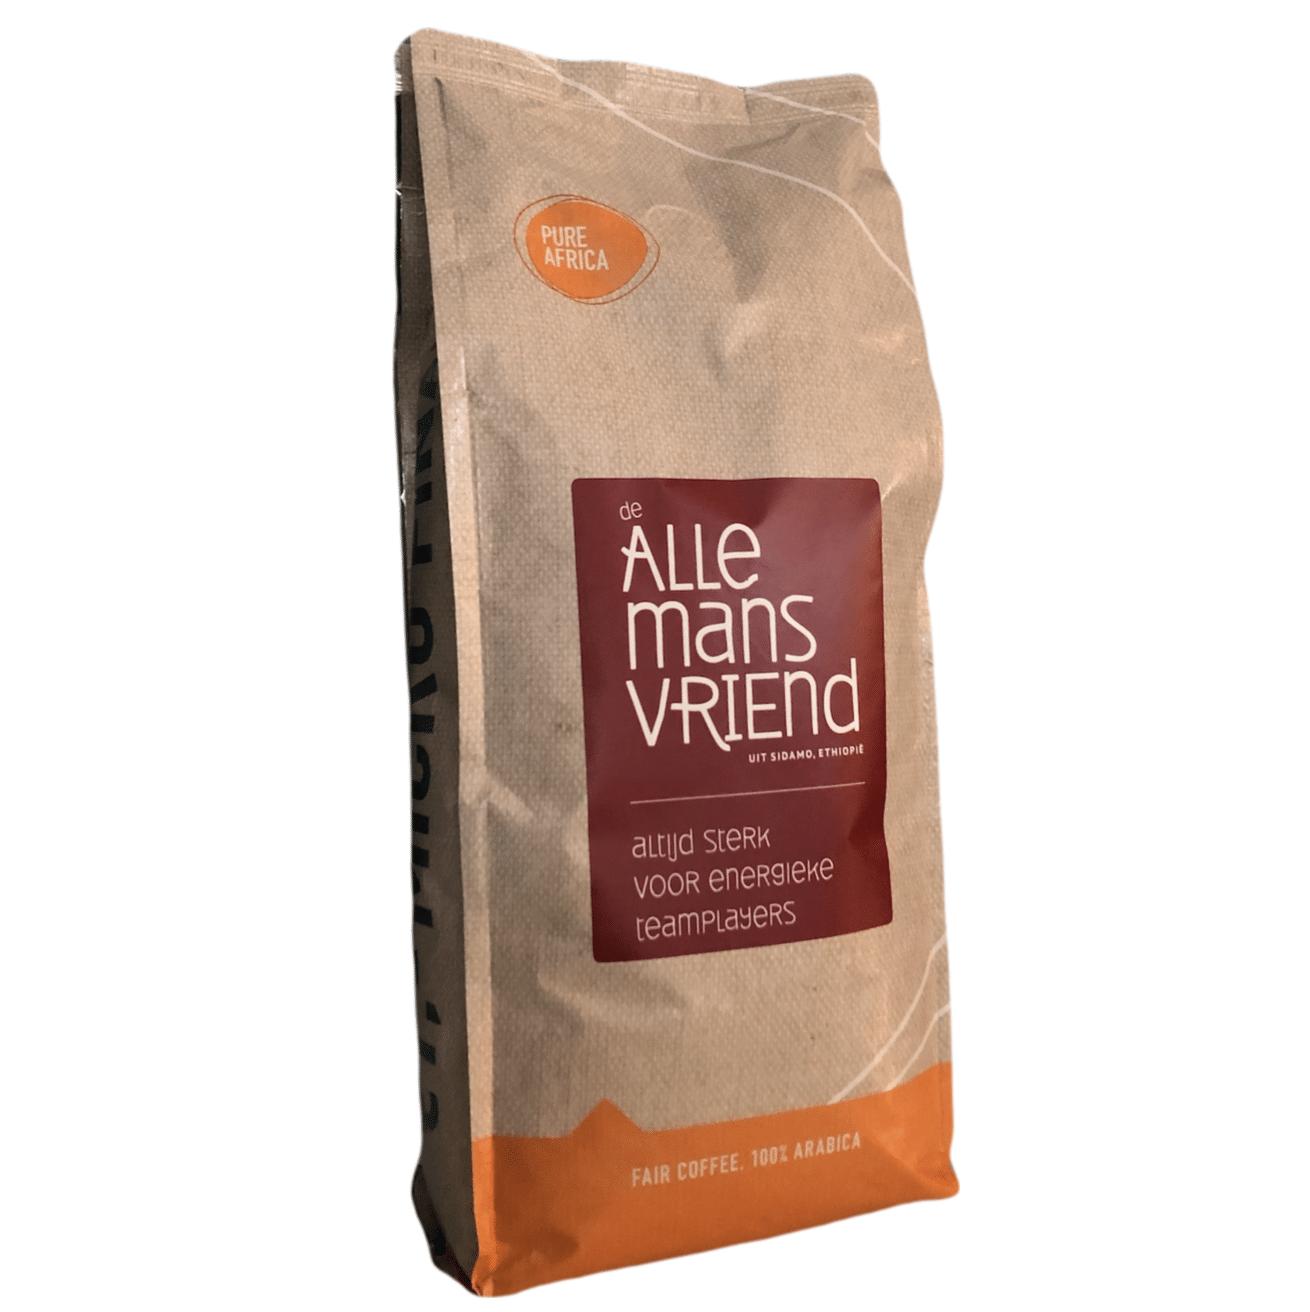 100% Arabica koffiebonen uit Ethiopië